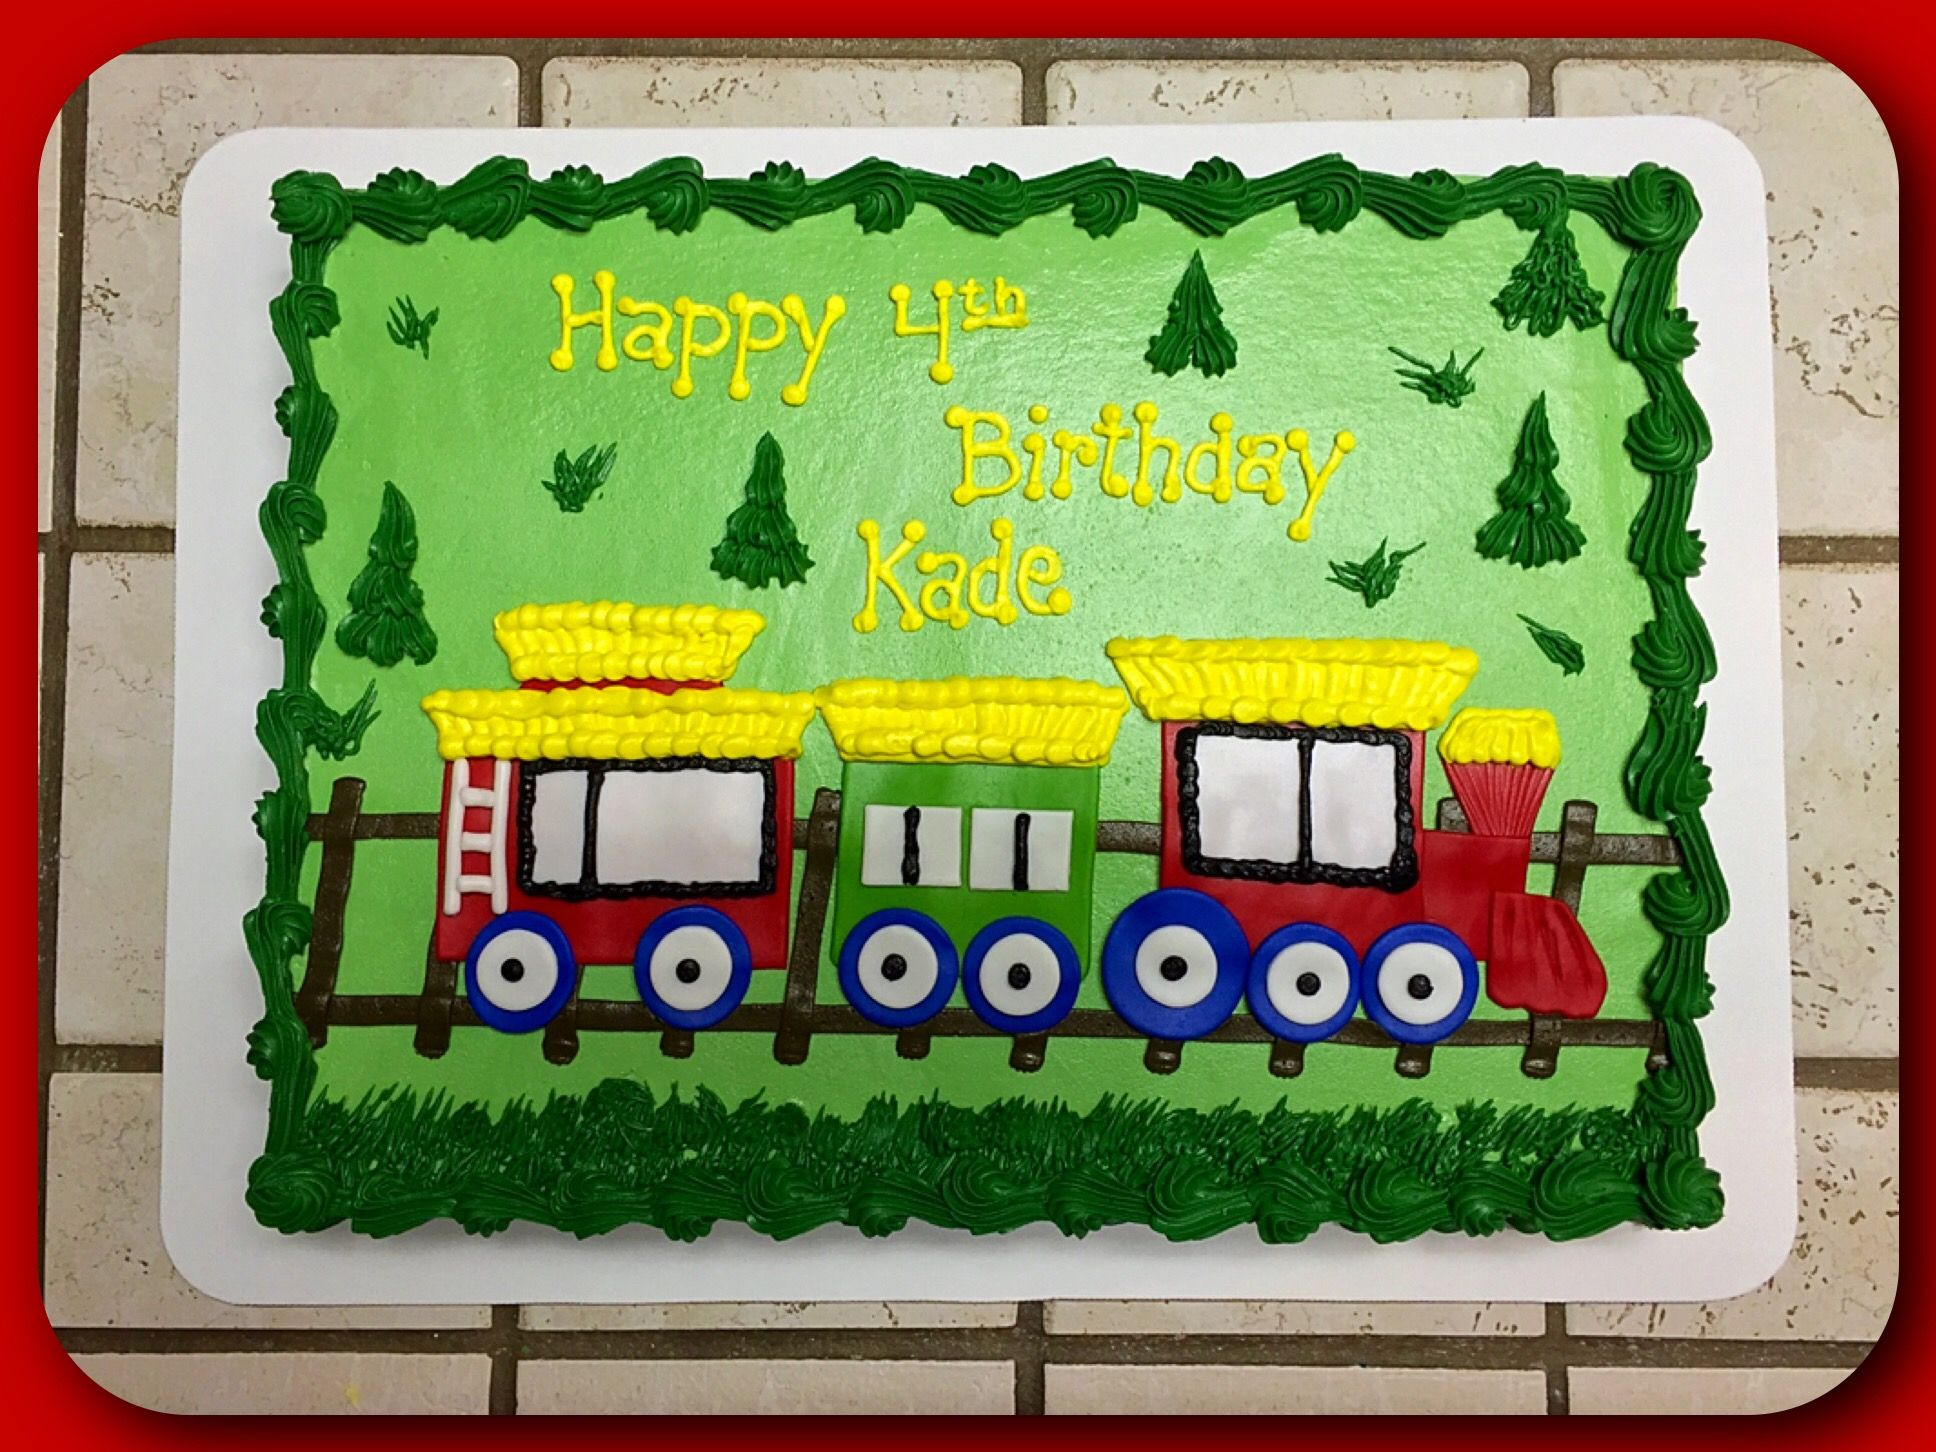 Astonishing A Choo Choo Train Sheet Cake Train Birthday Cake Train Birthday Personalised Birthday Cards Arneslily Jamesorg